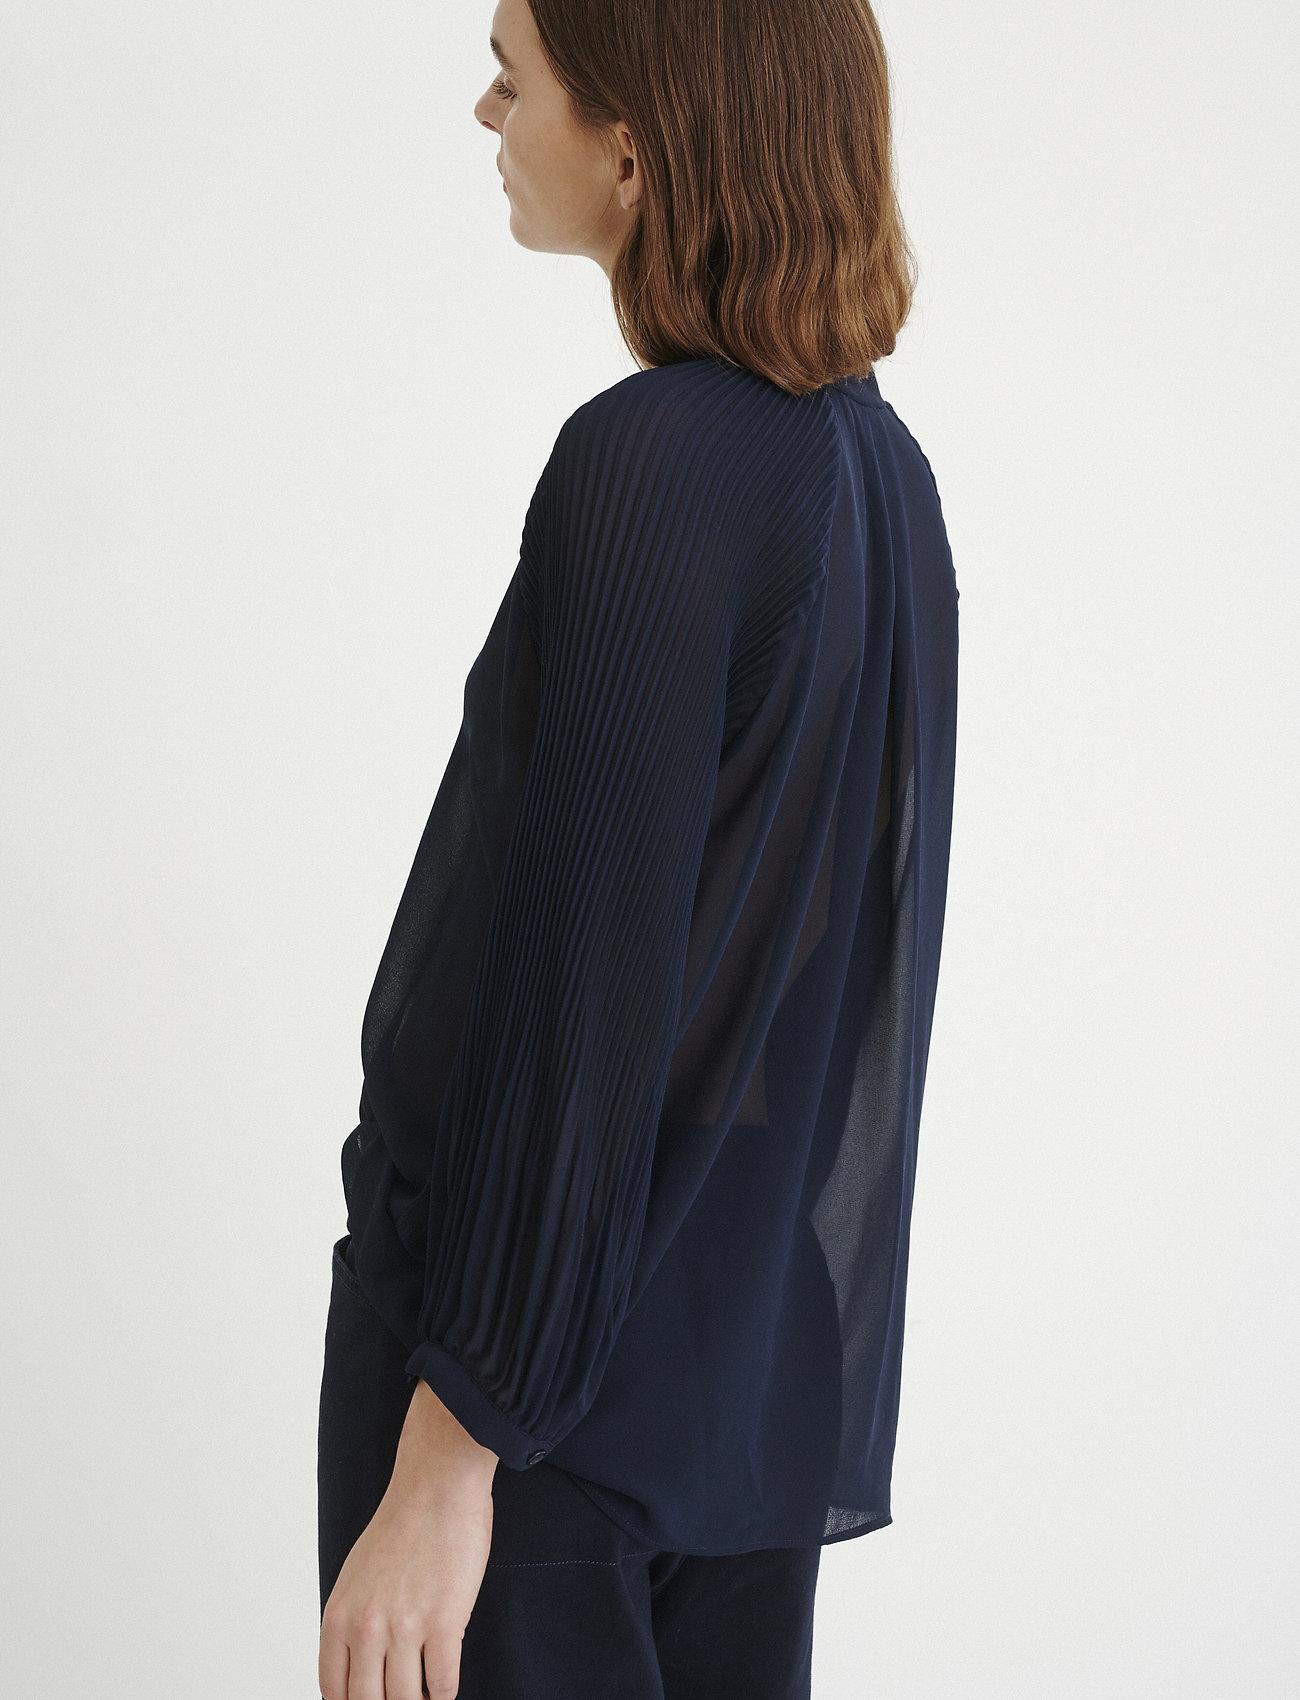 InWear RosieIW Shirt - Bluser & Skjorter MARINE BLUE - Dameklær Spesialtilbud